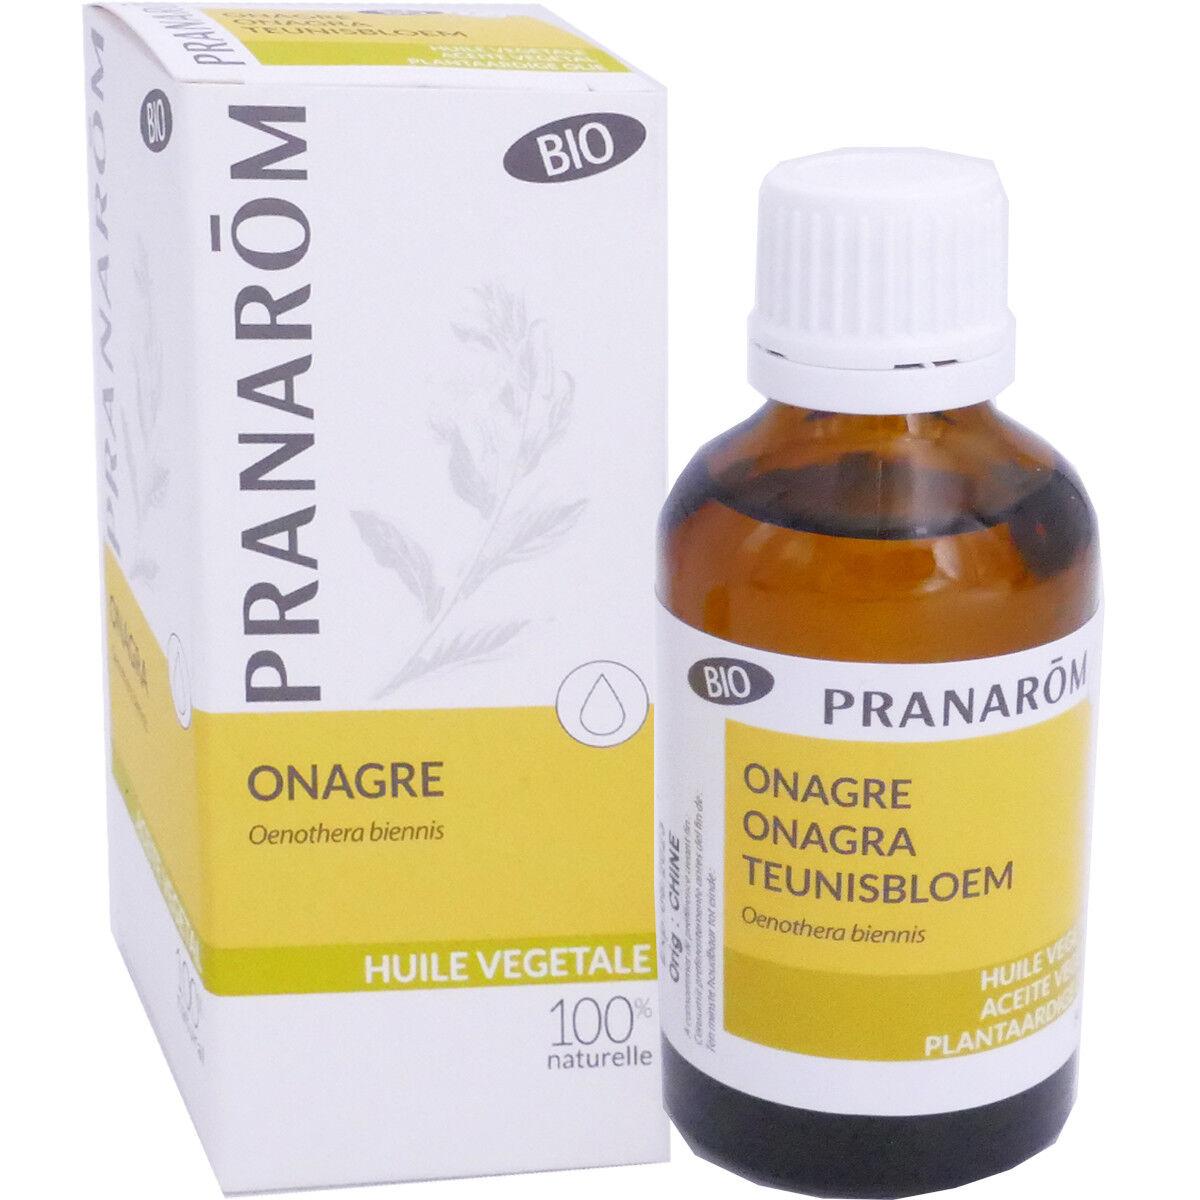 Pranarom bio huile vegetale onagre 50 ml